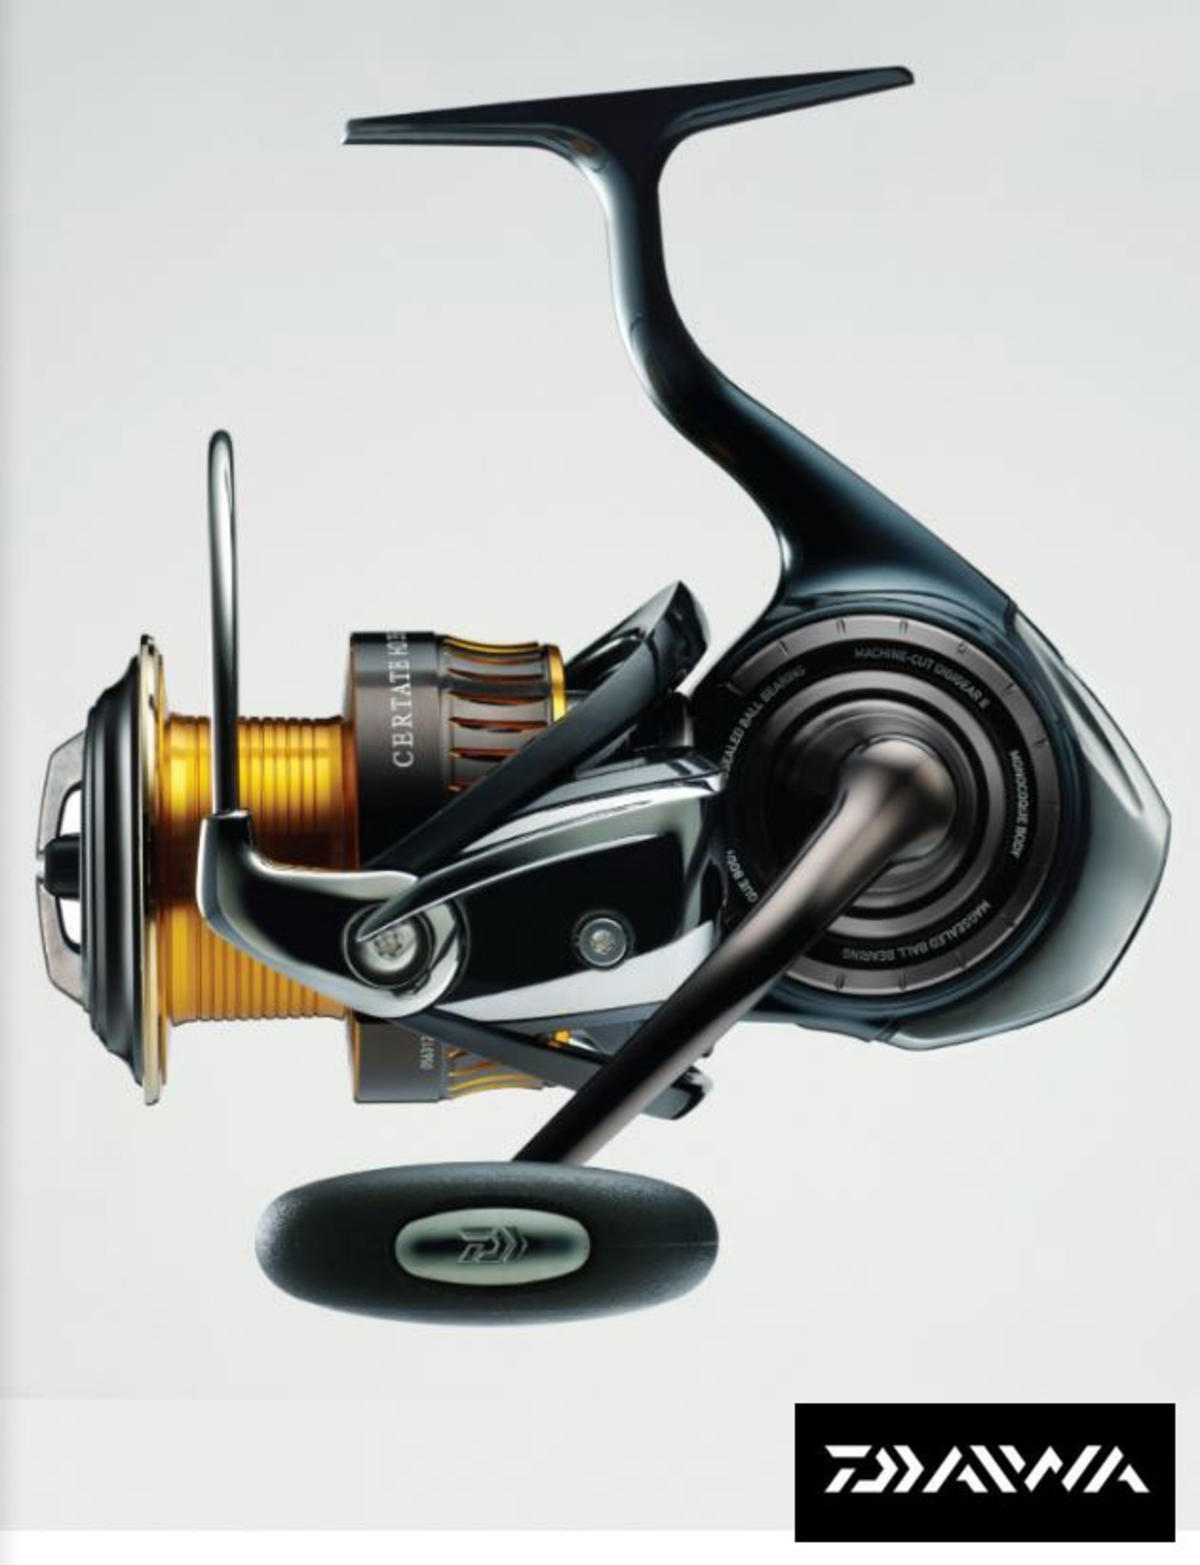 Ex Display Daiwa 16 Certate 2004CH Spinning Reel Model No. 16 CERTATE 2004CH